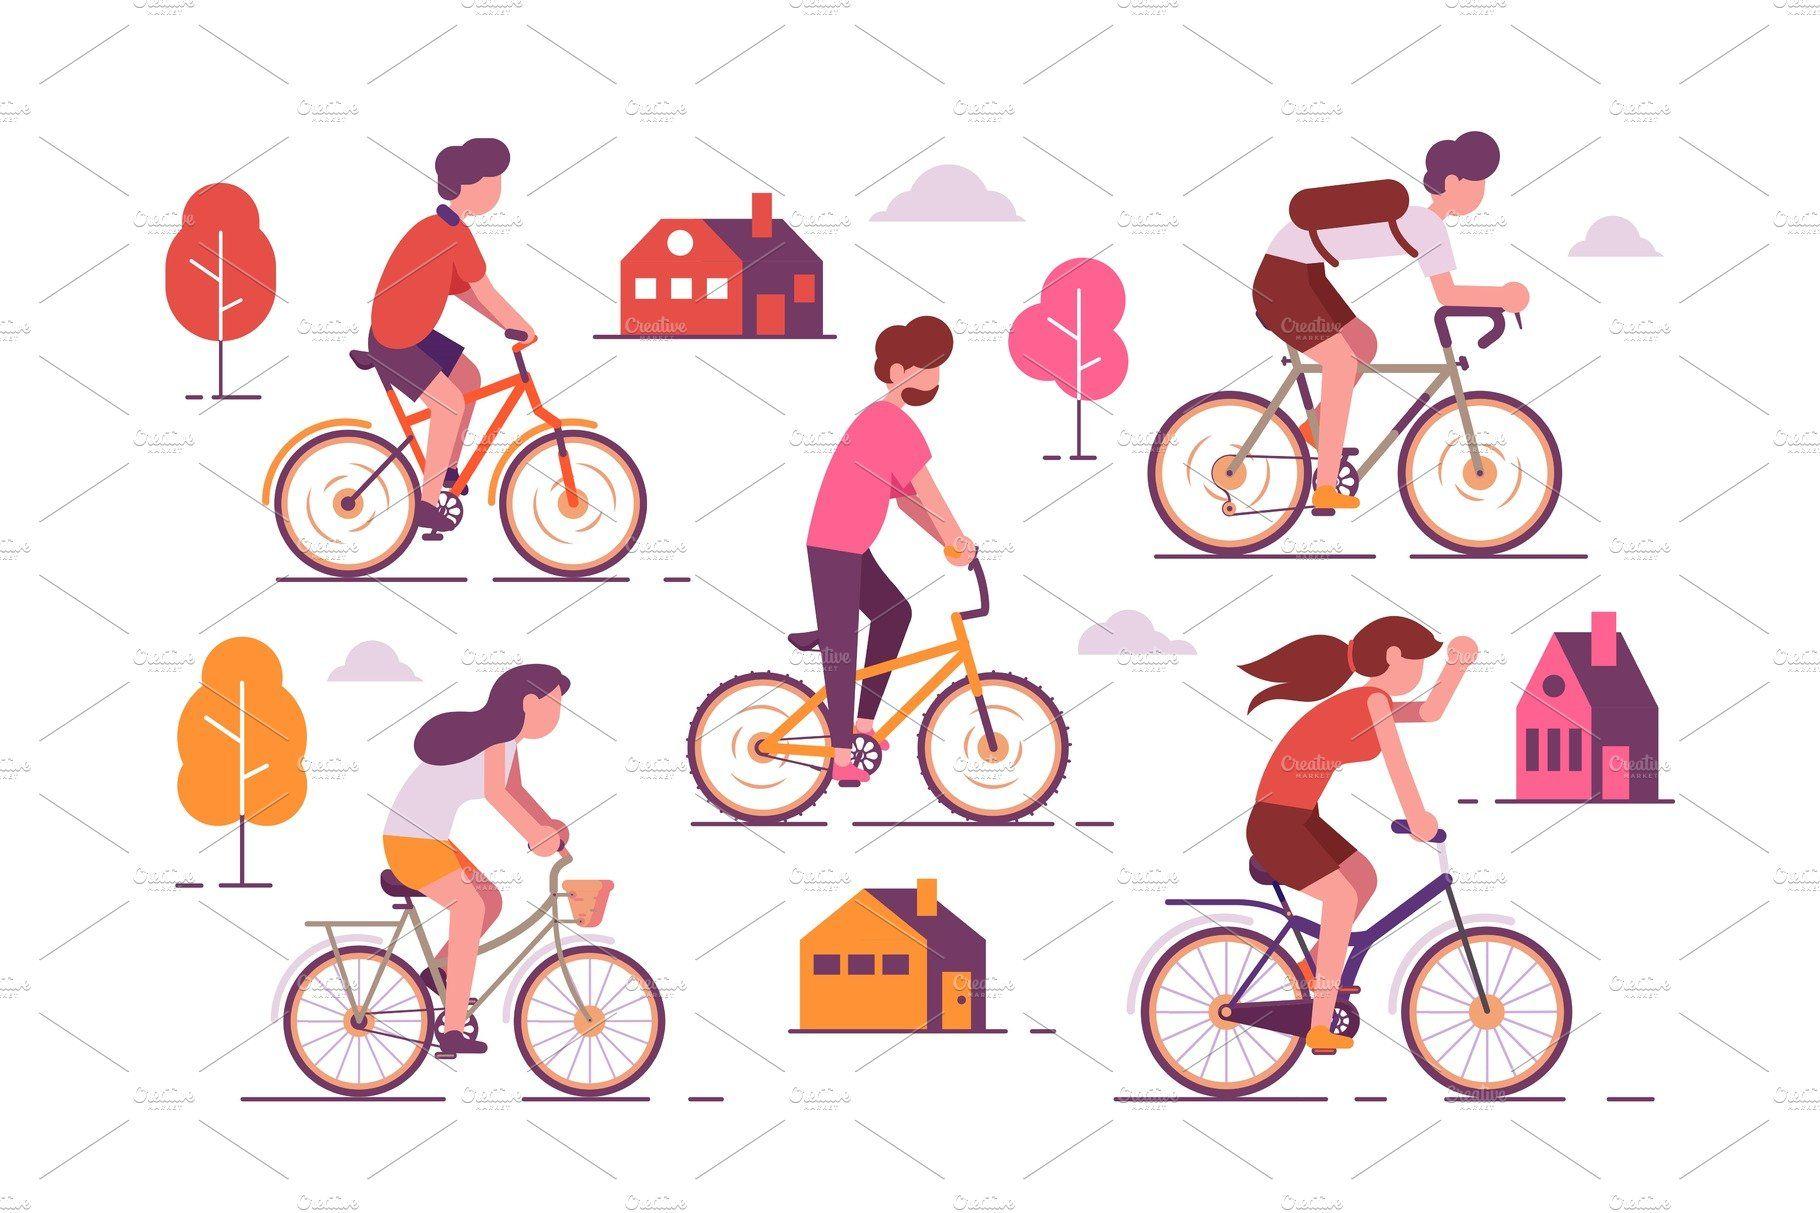 People Riding Bikes Bike Ride Bike Illustration Bike